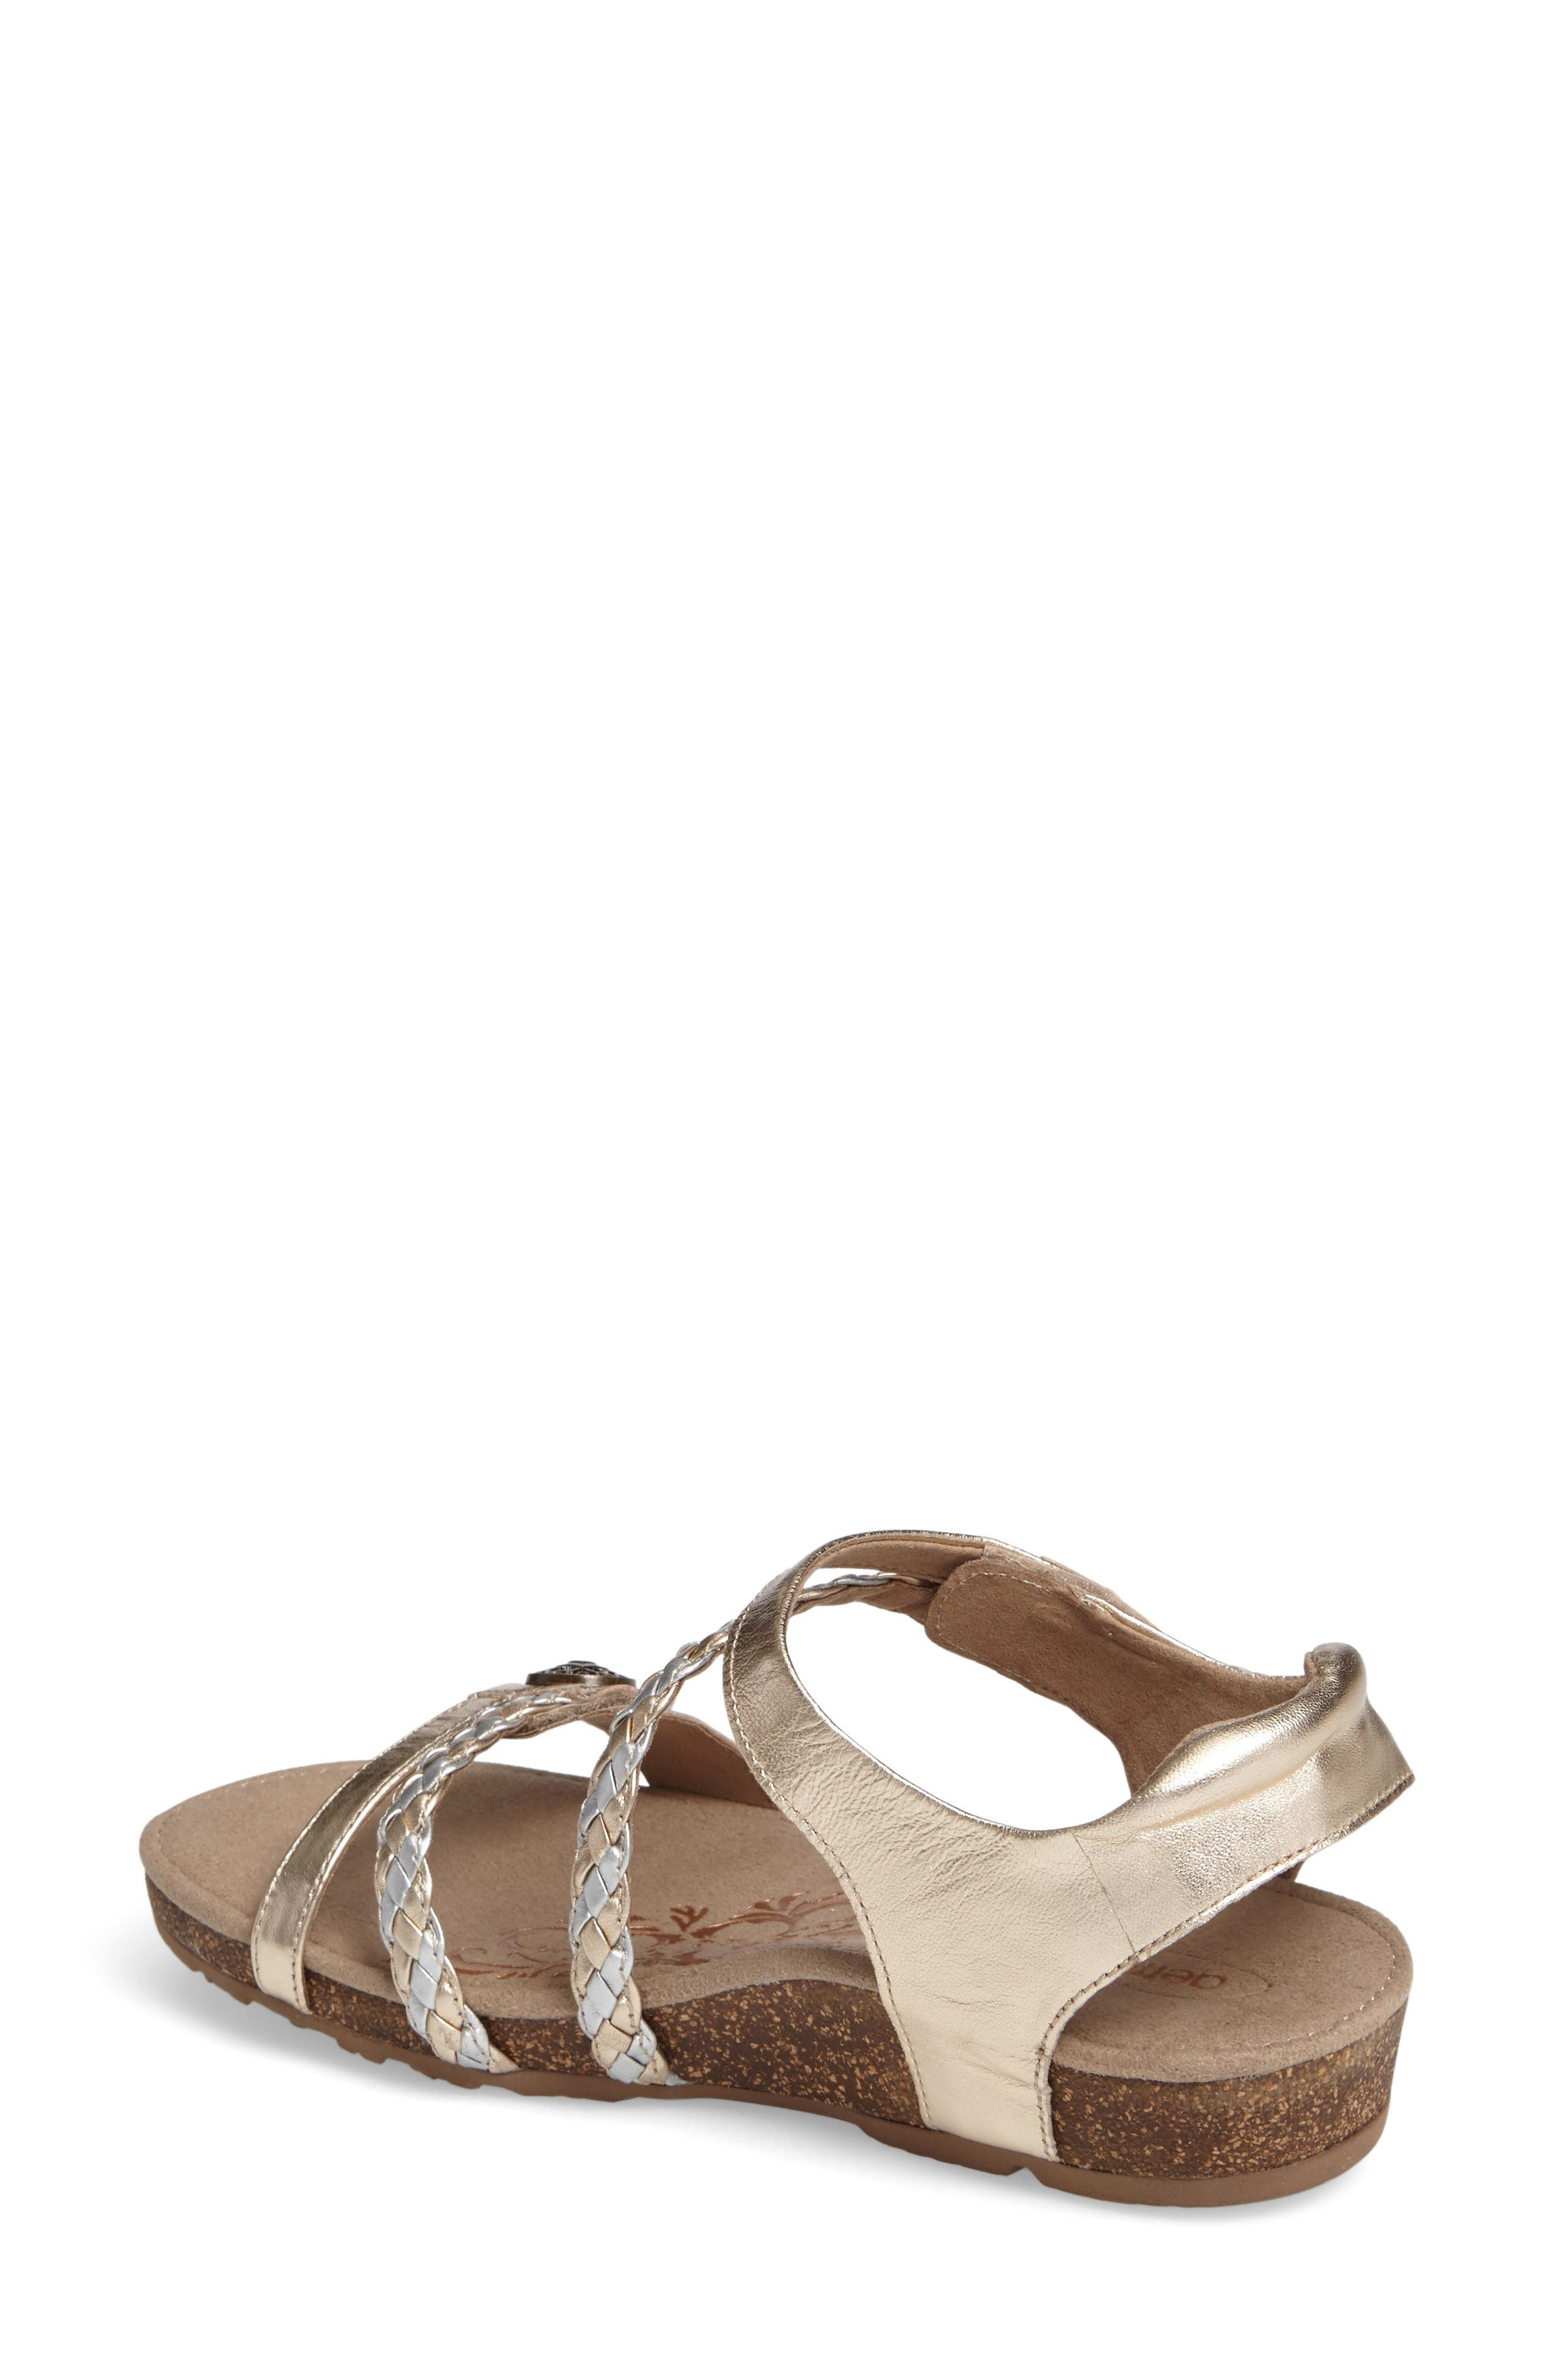 Alternate Image 2  - Aetrex 'Jillian' Braided Leather Strap Sandal (Women)